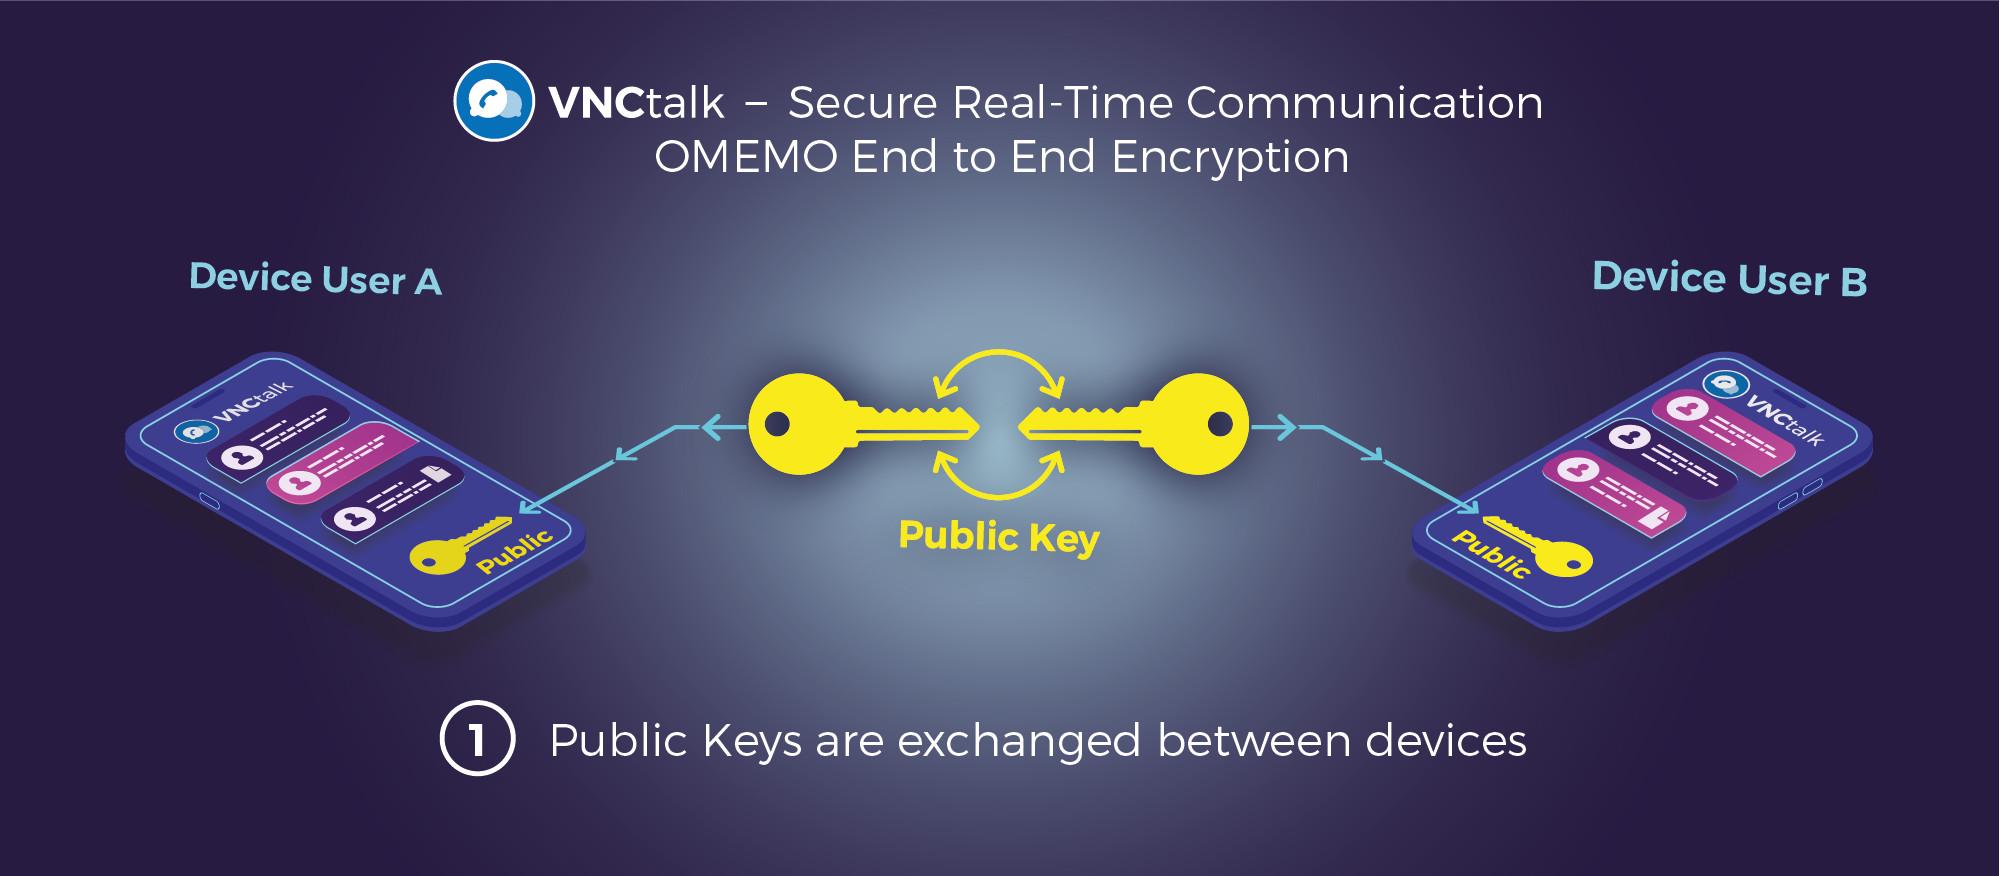 OMEMO Encryption in VNCtalk